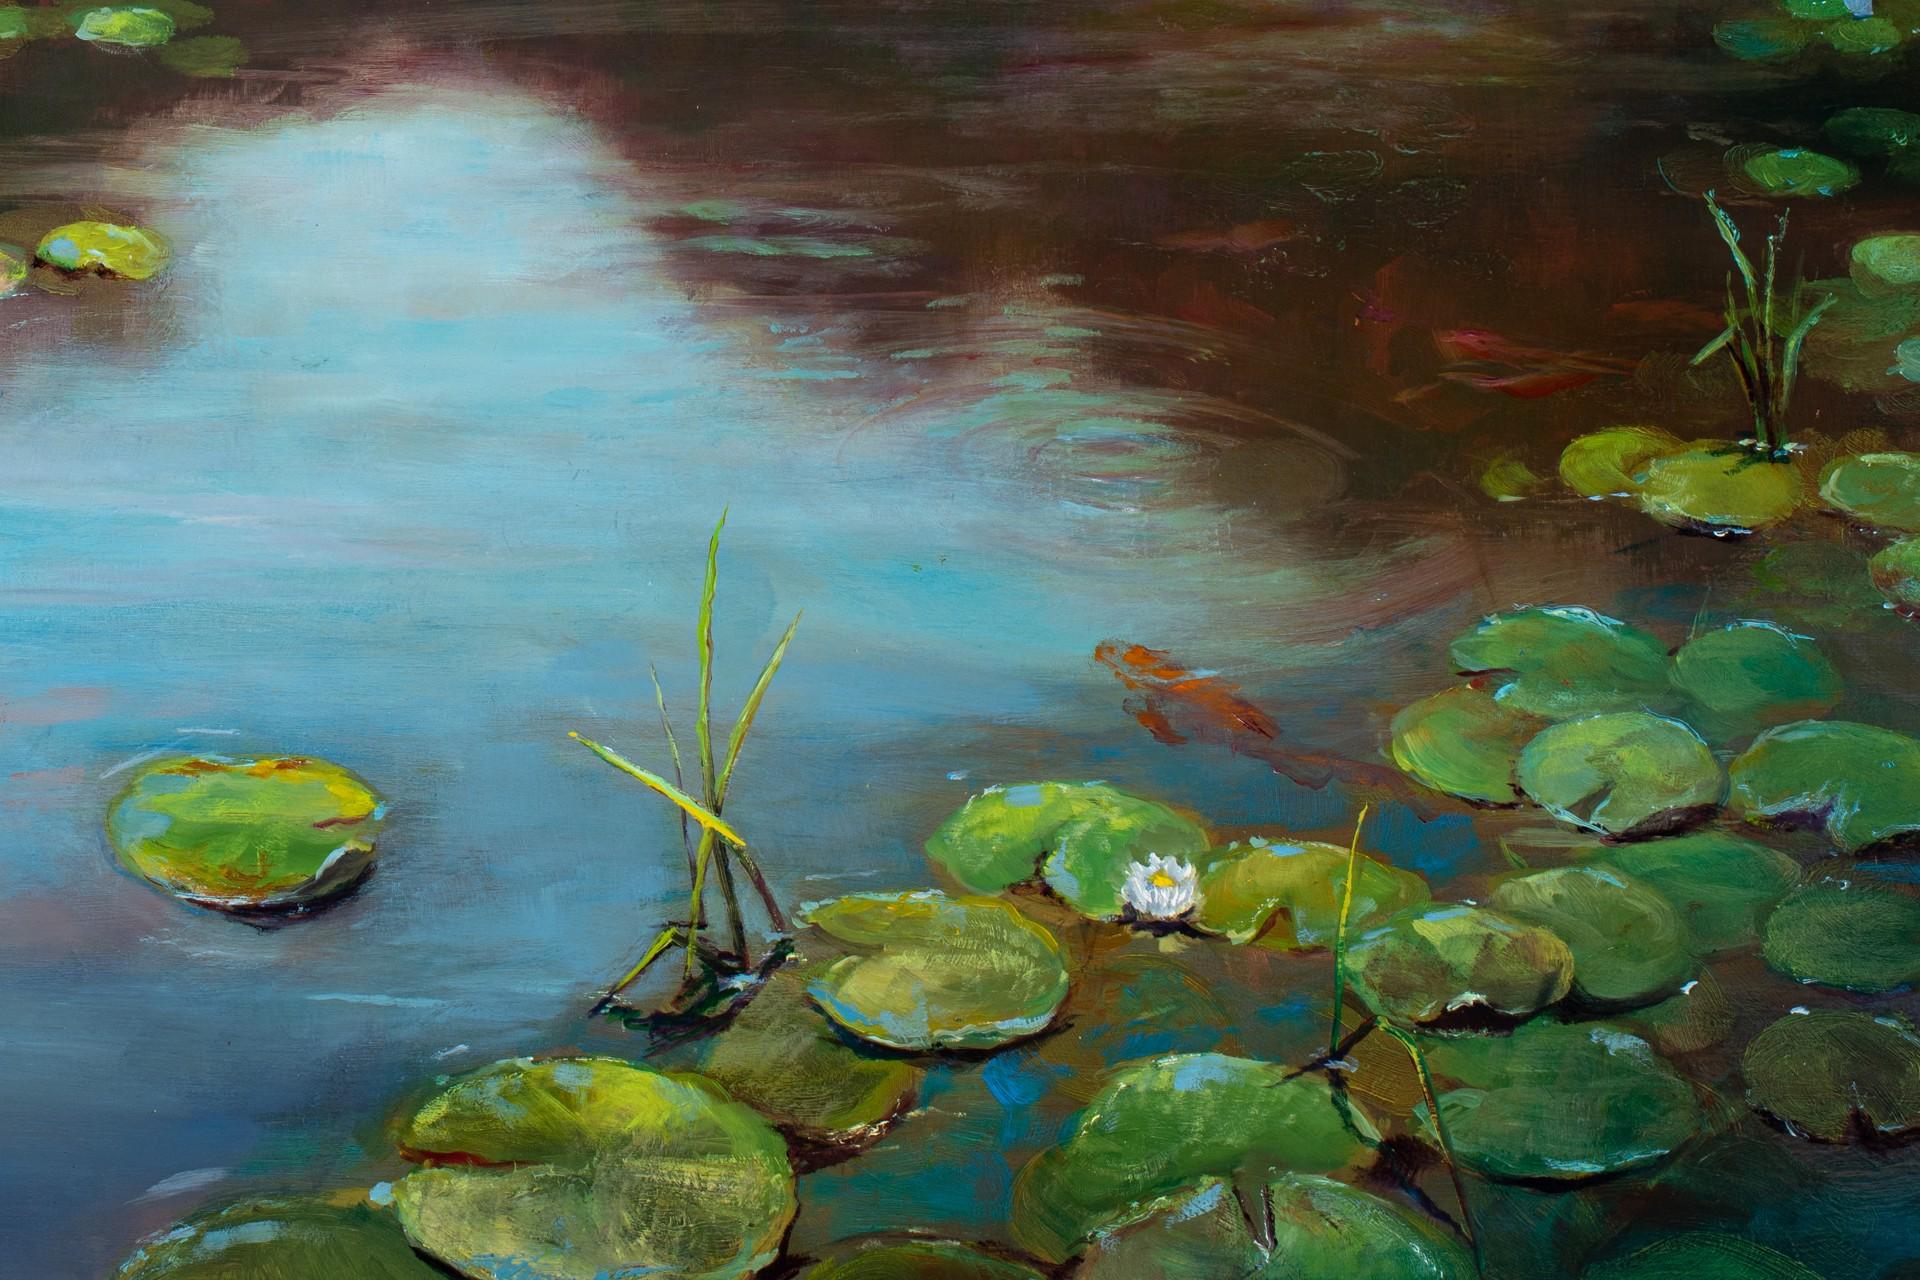 Shades of Green by Isaiah Ratterman